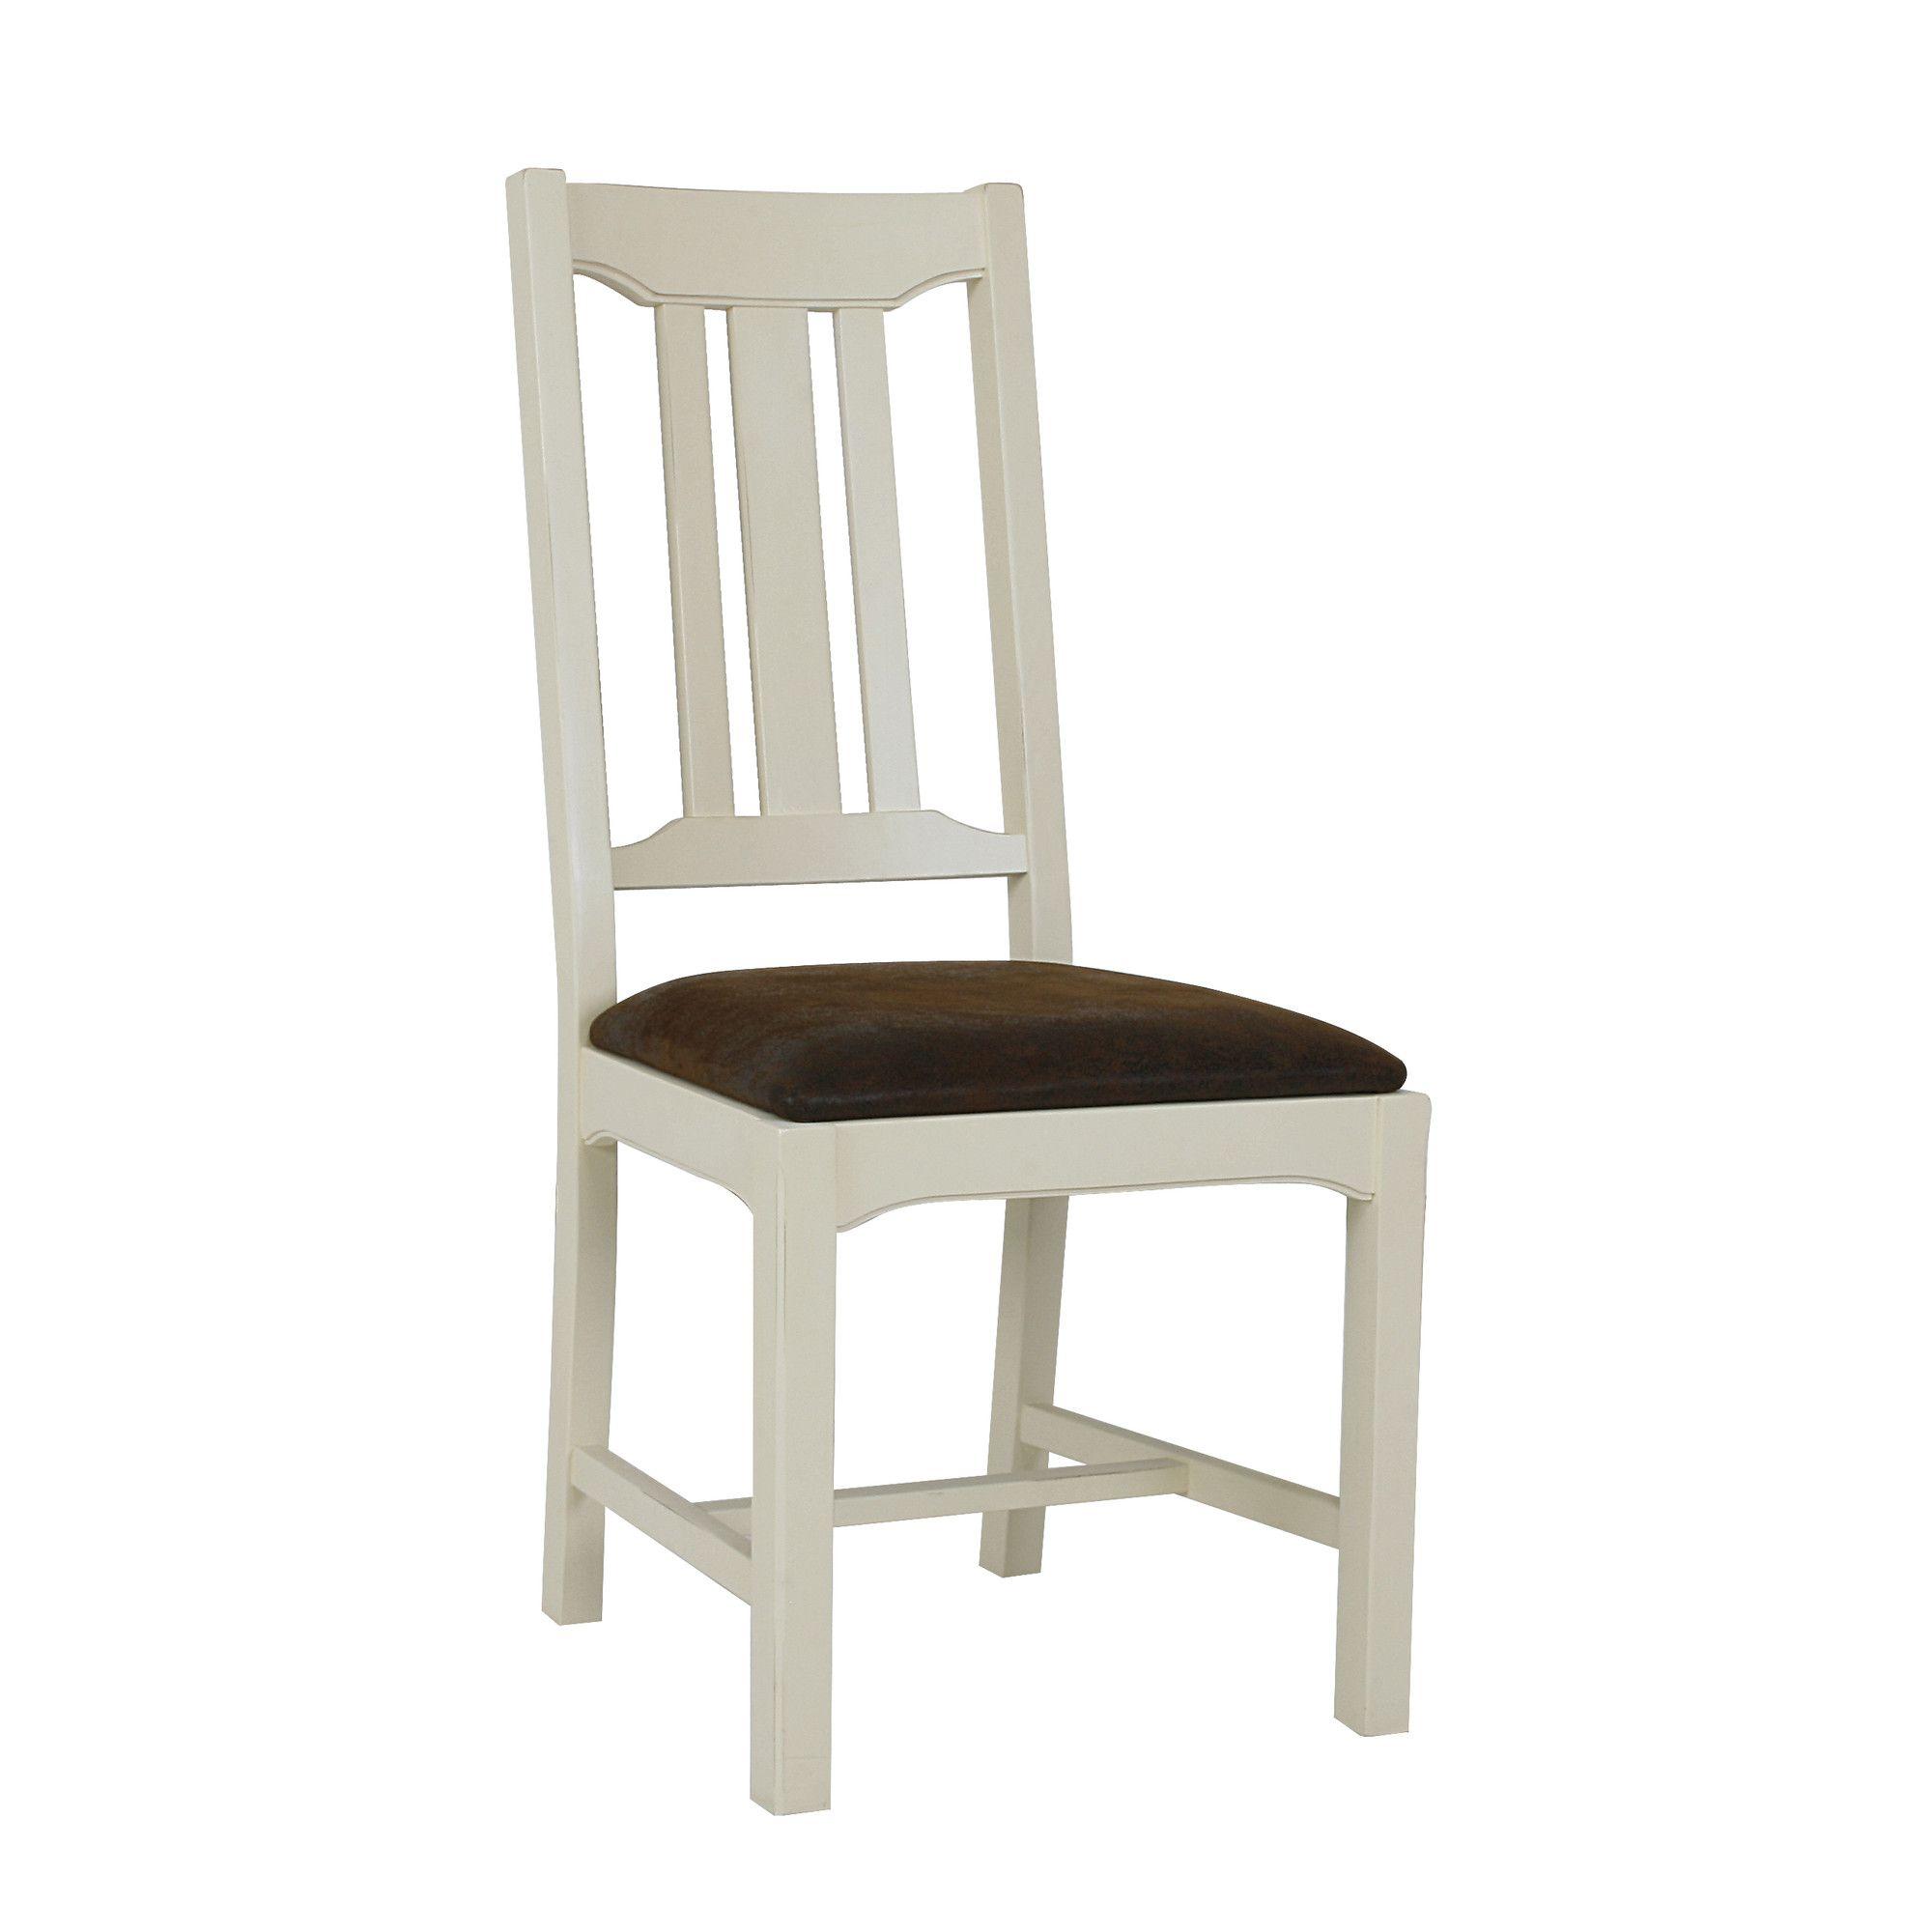 Alterton Furniture WPM Oak Dining Chair (Set of 2)